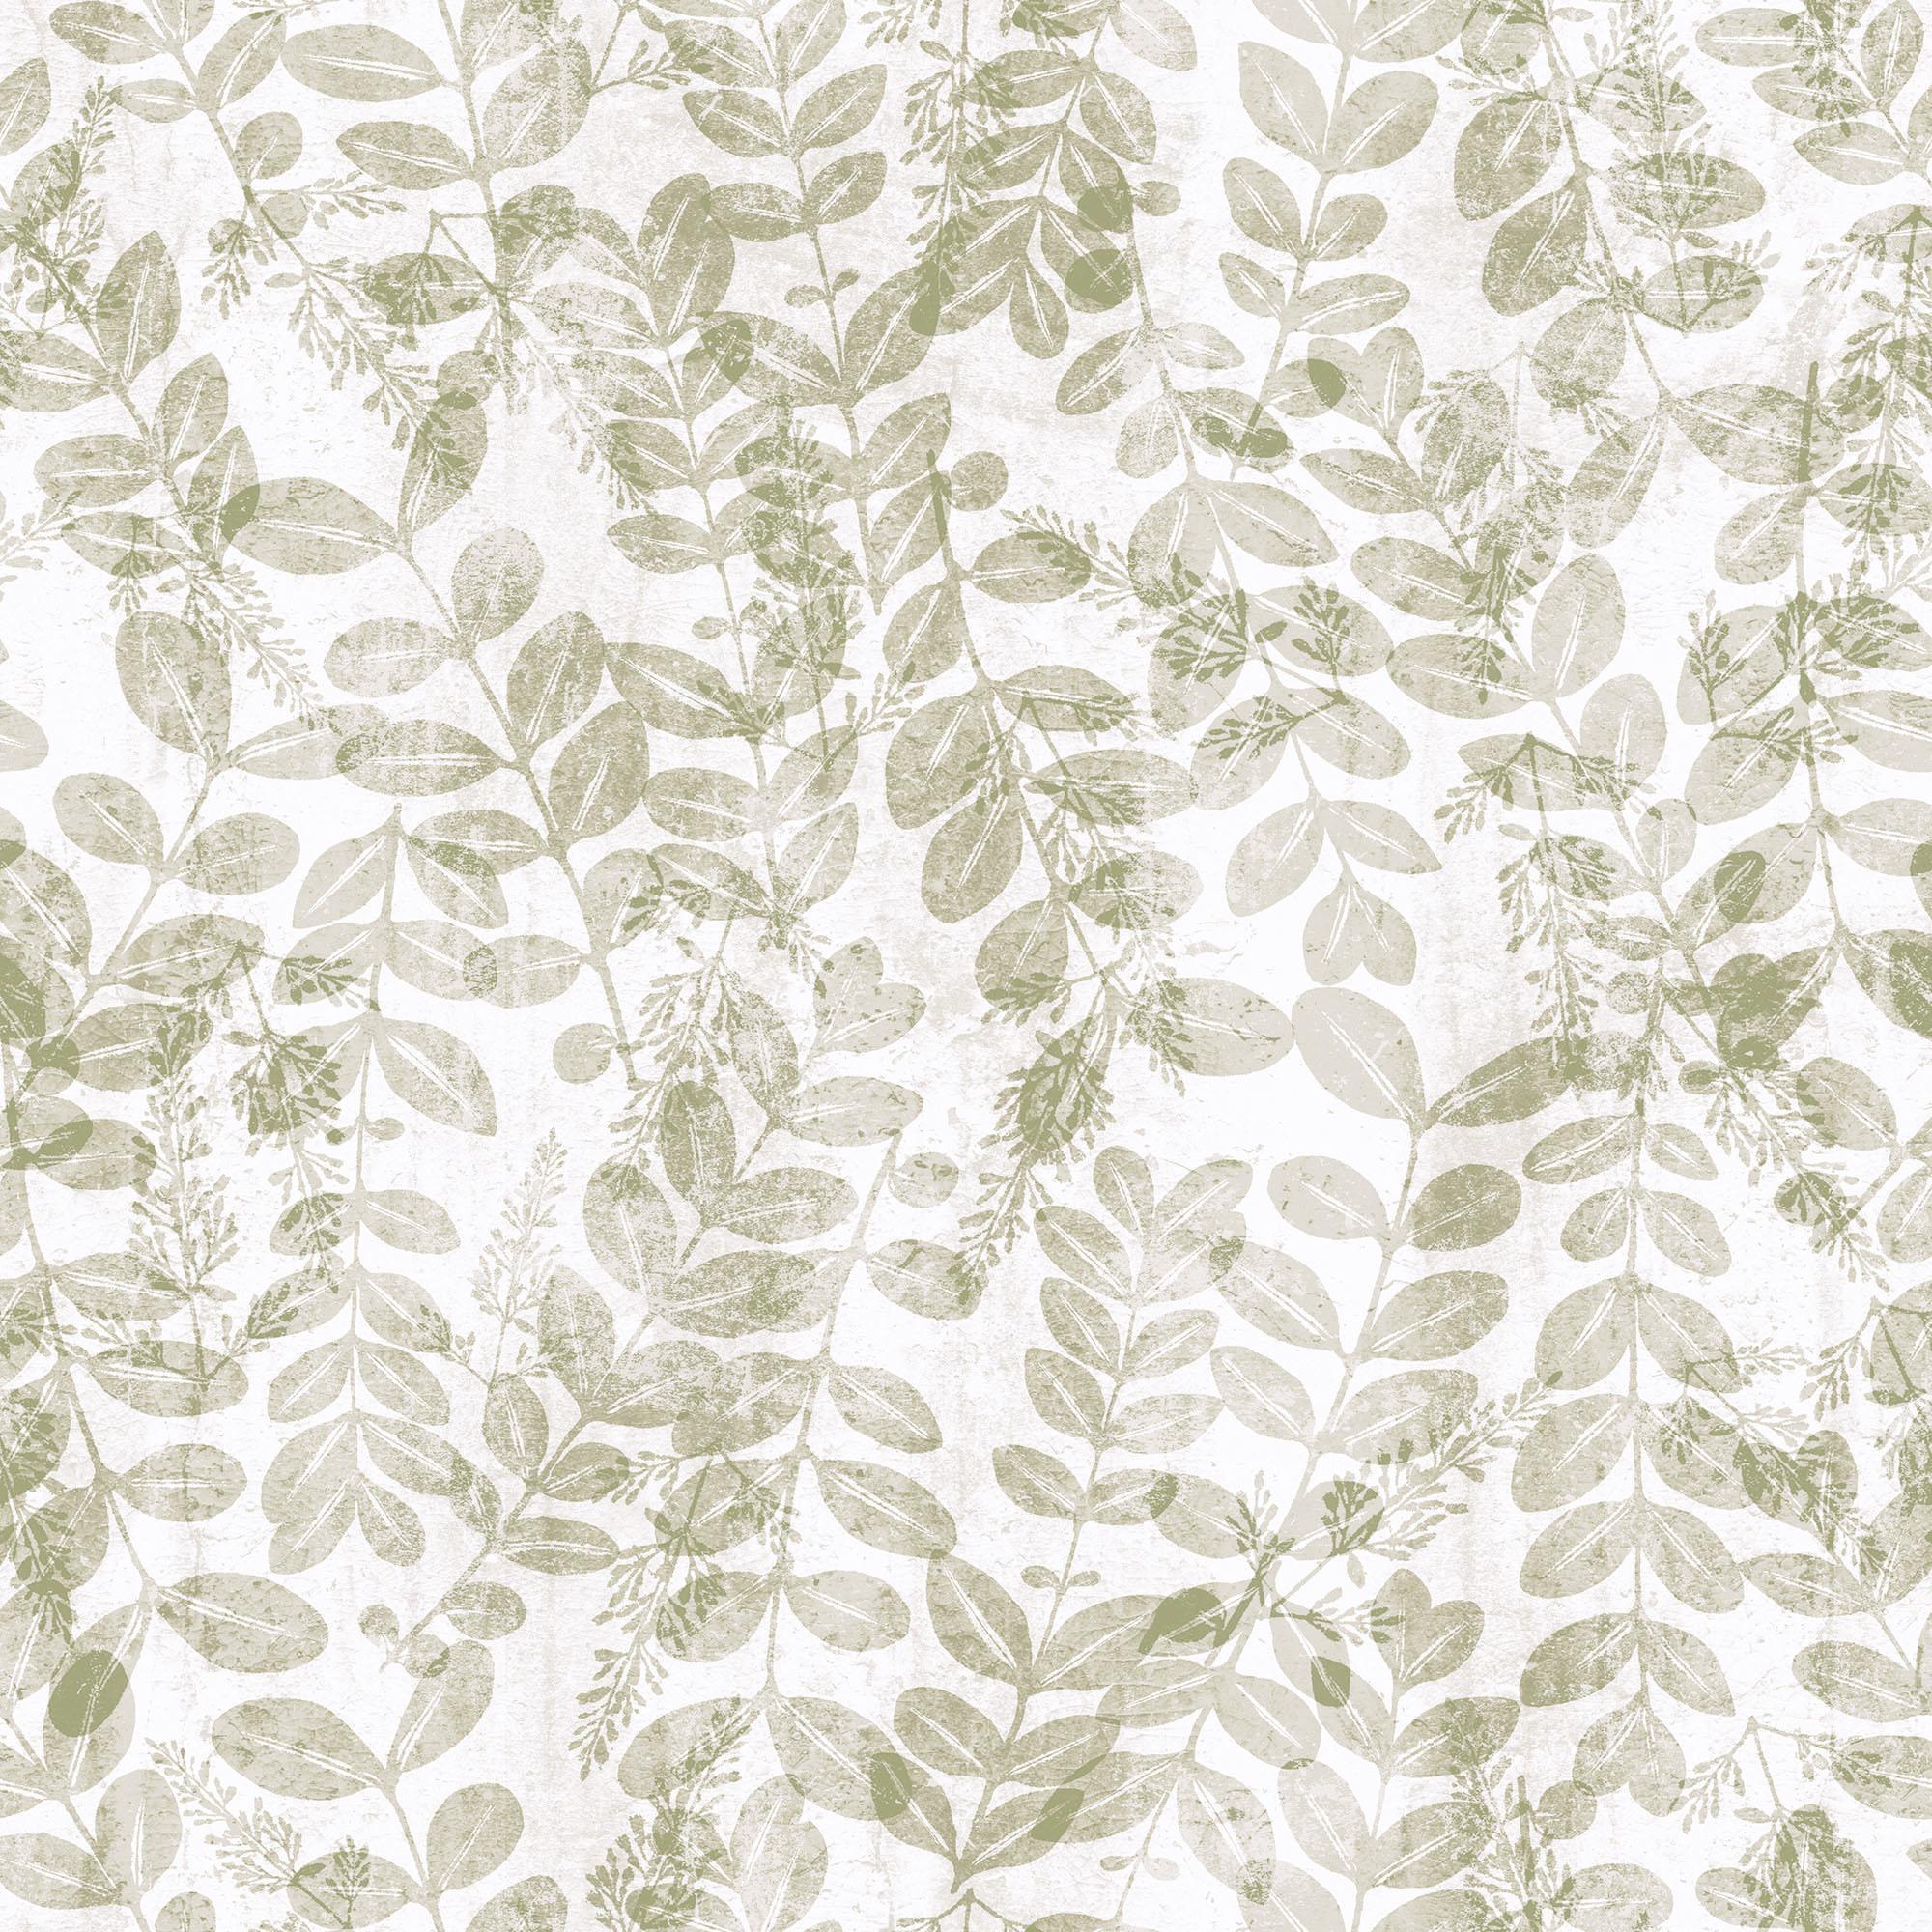 Papel mural vinilizado zen hojas beige 3711 1 cinthiasa for Colocar papel mural